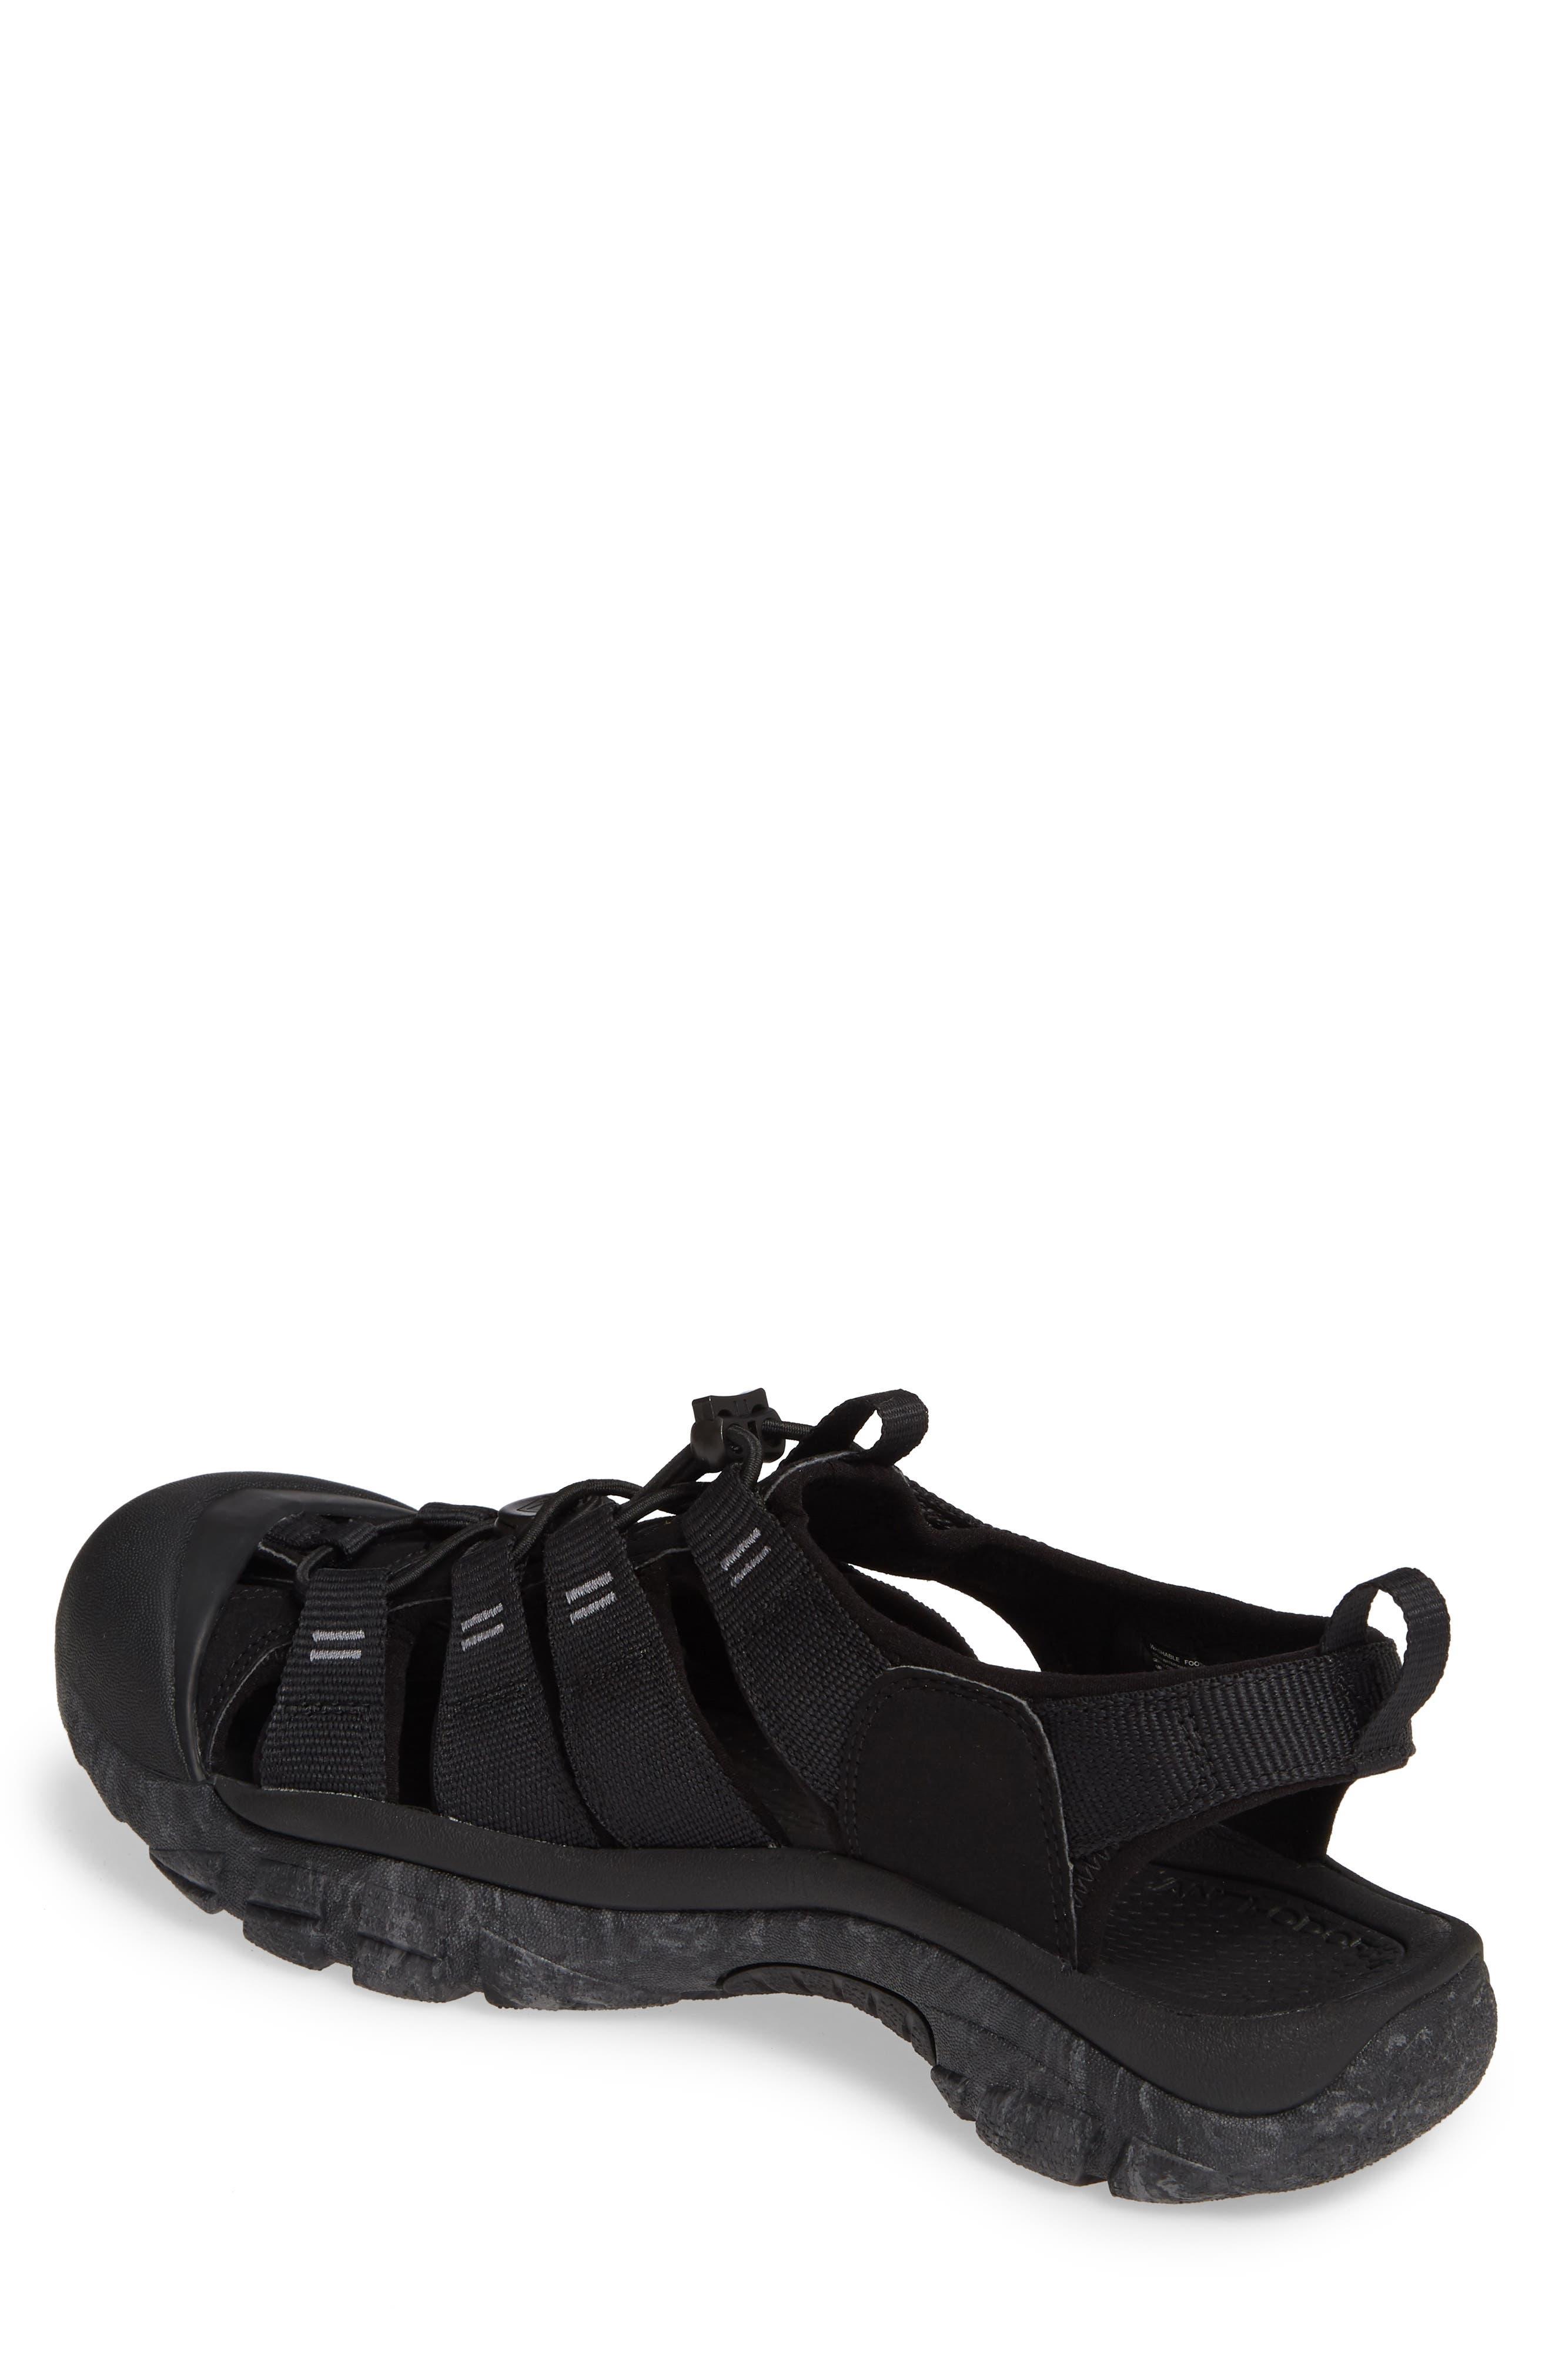 KEEN, 'Newport H2' Sandal, Alternate thumbnail 2, color, BLACK/ SWIRL OUTSOLE